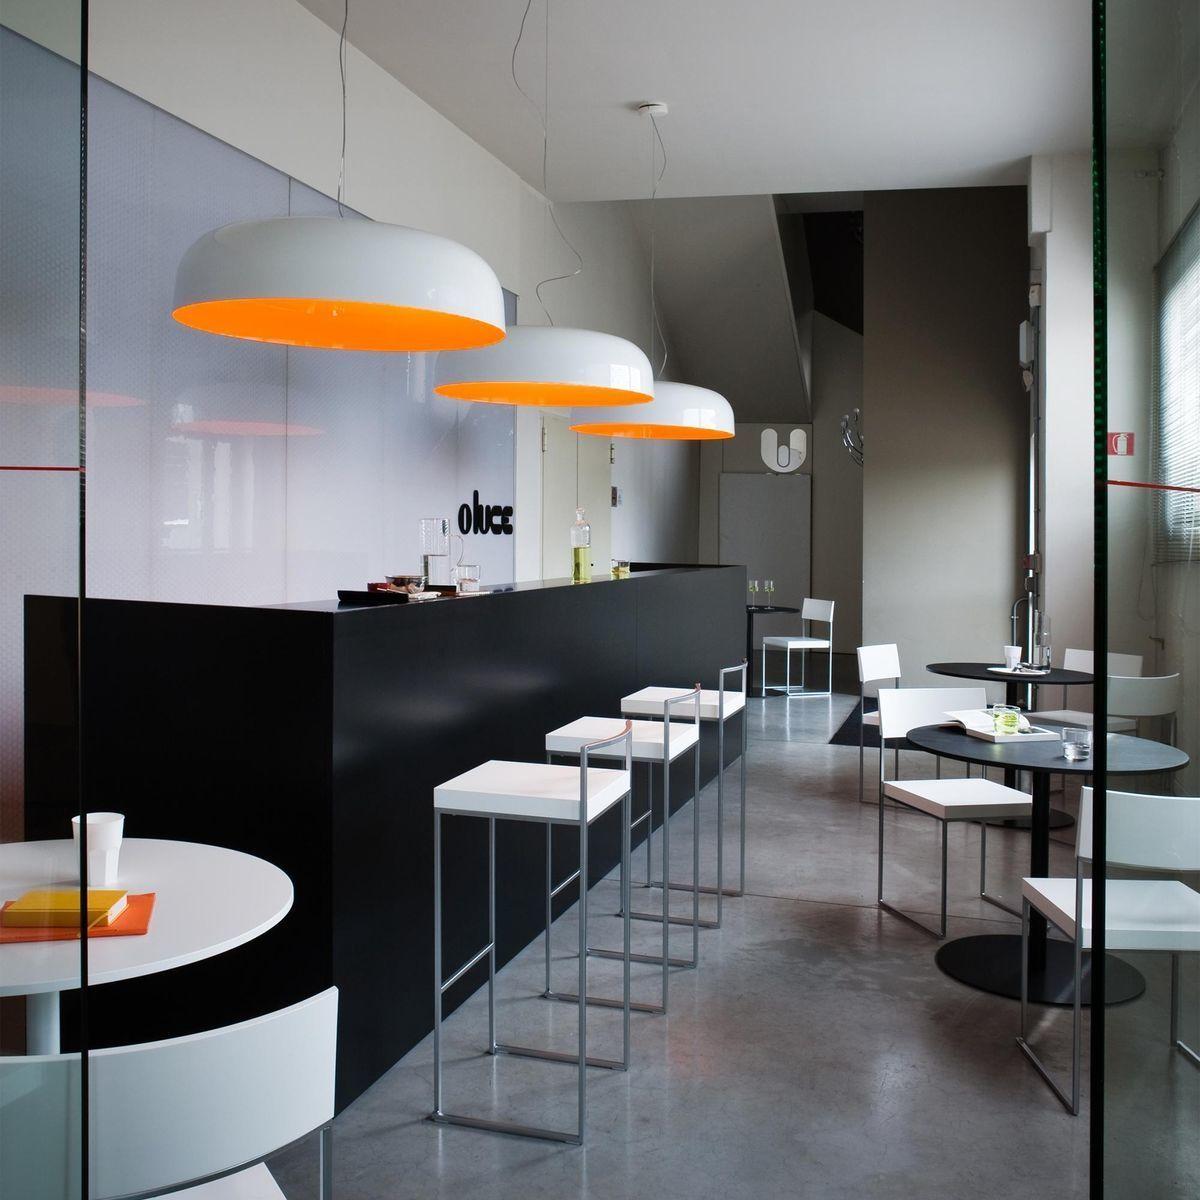 cubo barhocker 65cm la palma. Black Bedroom Furniture Sets. Home Design Ideas